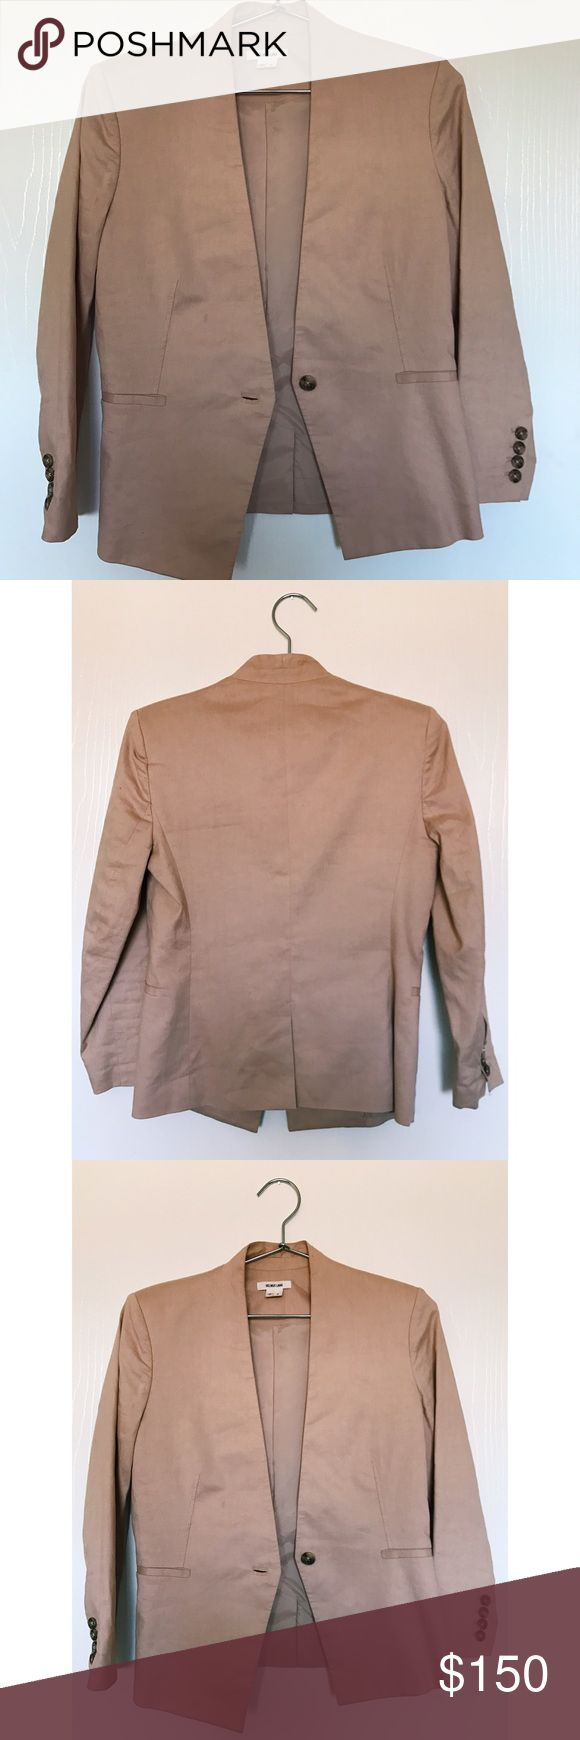 Helmut Lang Blazer Dusty Pink Helmut Lang Blazer Helmut Lang Jackets & Coats Blazers